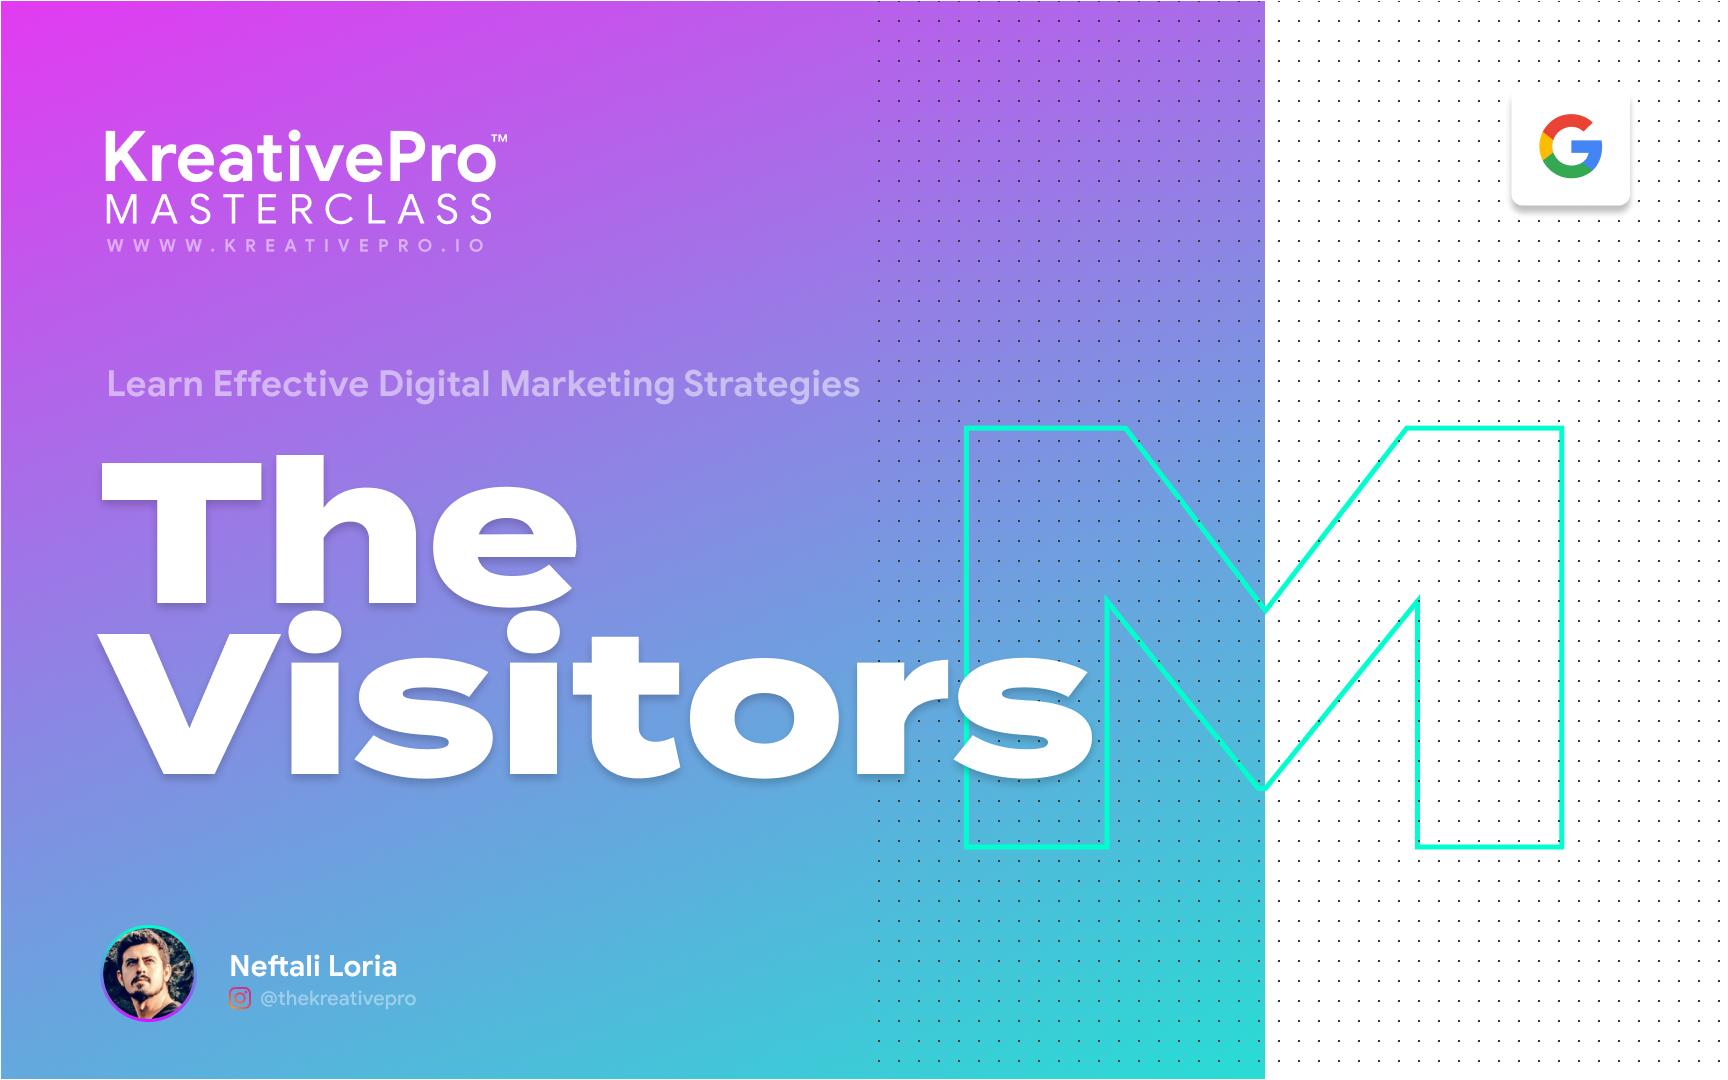 Marketing 2.0 - Website Visitors